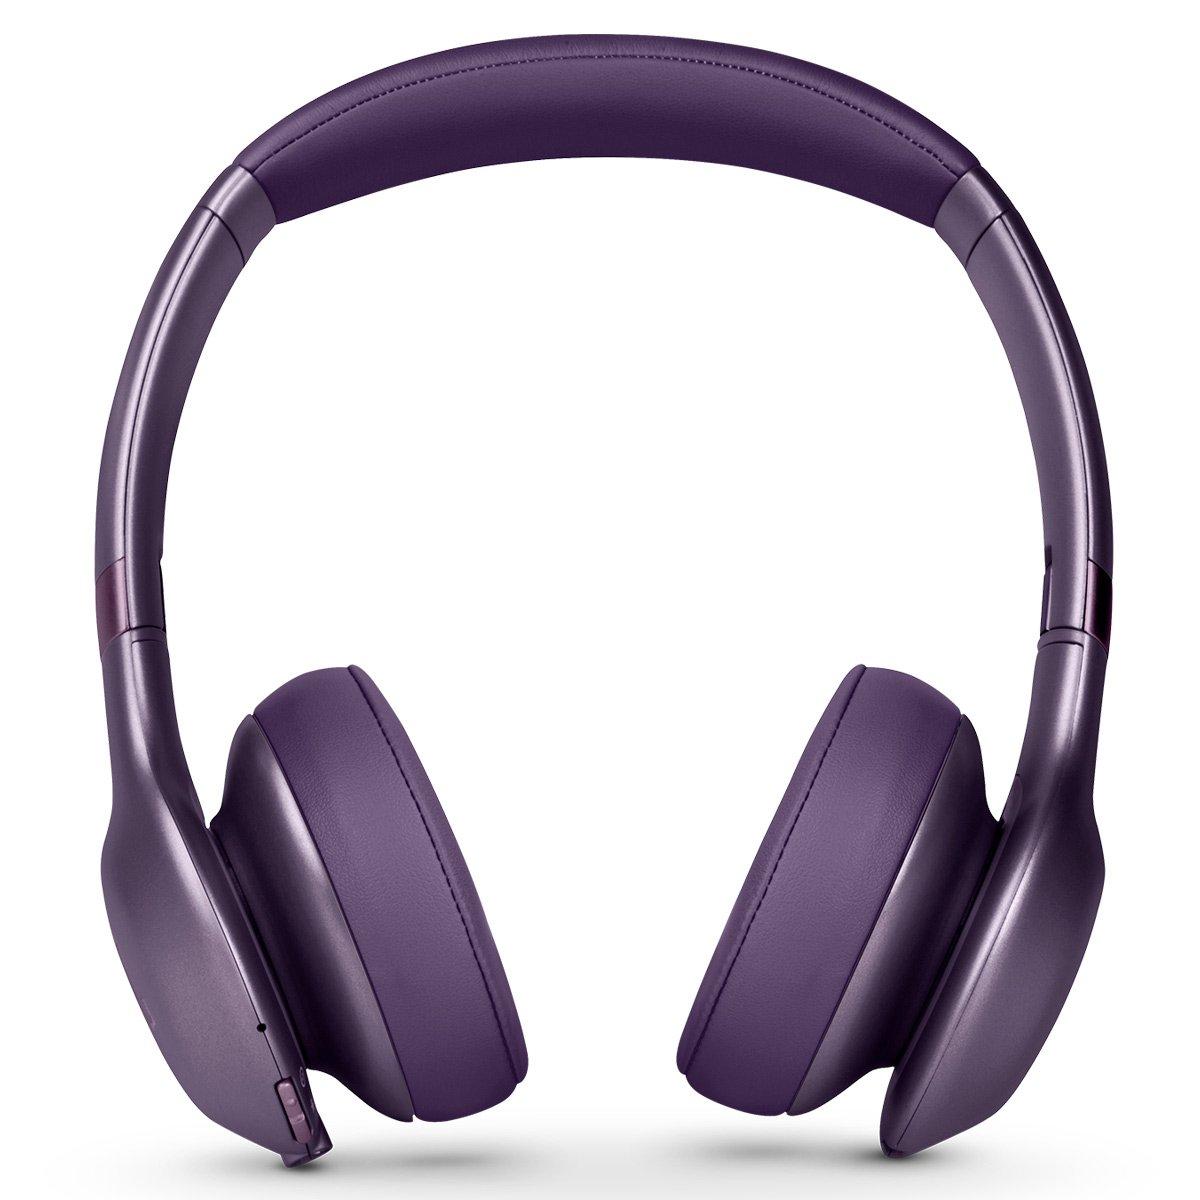 JBL V310BTPUR Everest 310 Wireless On-Ear Headphones (Purple) by JBL